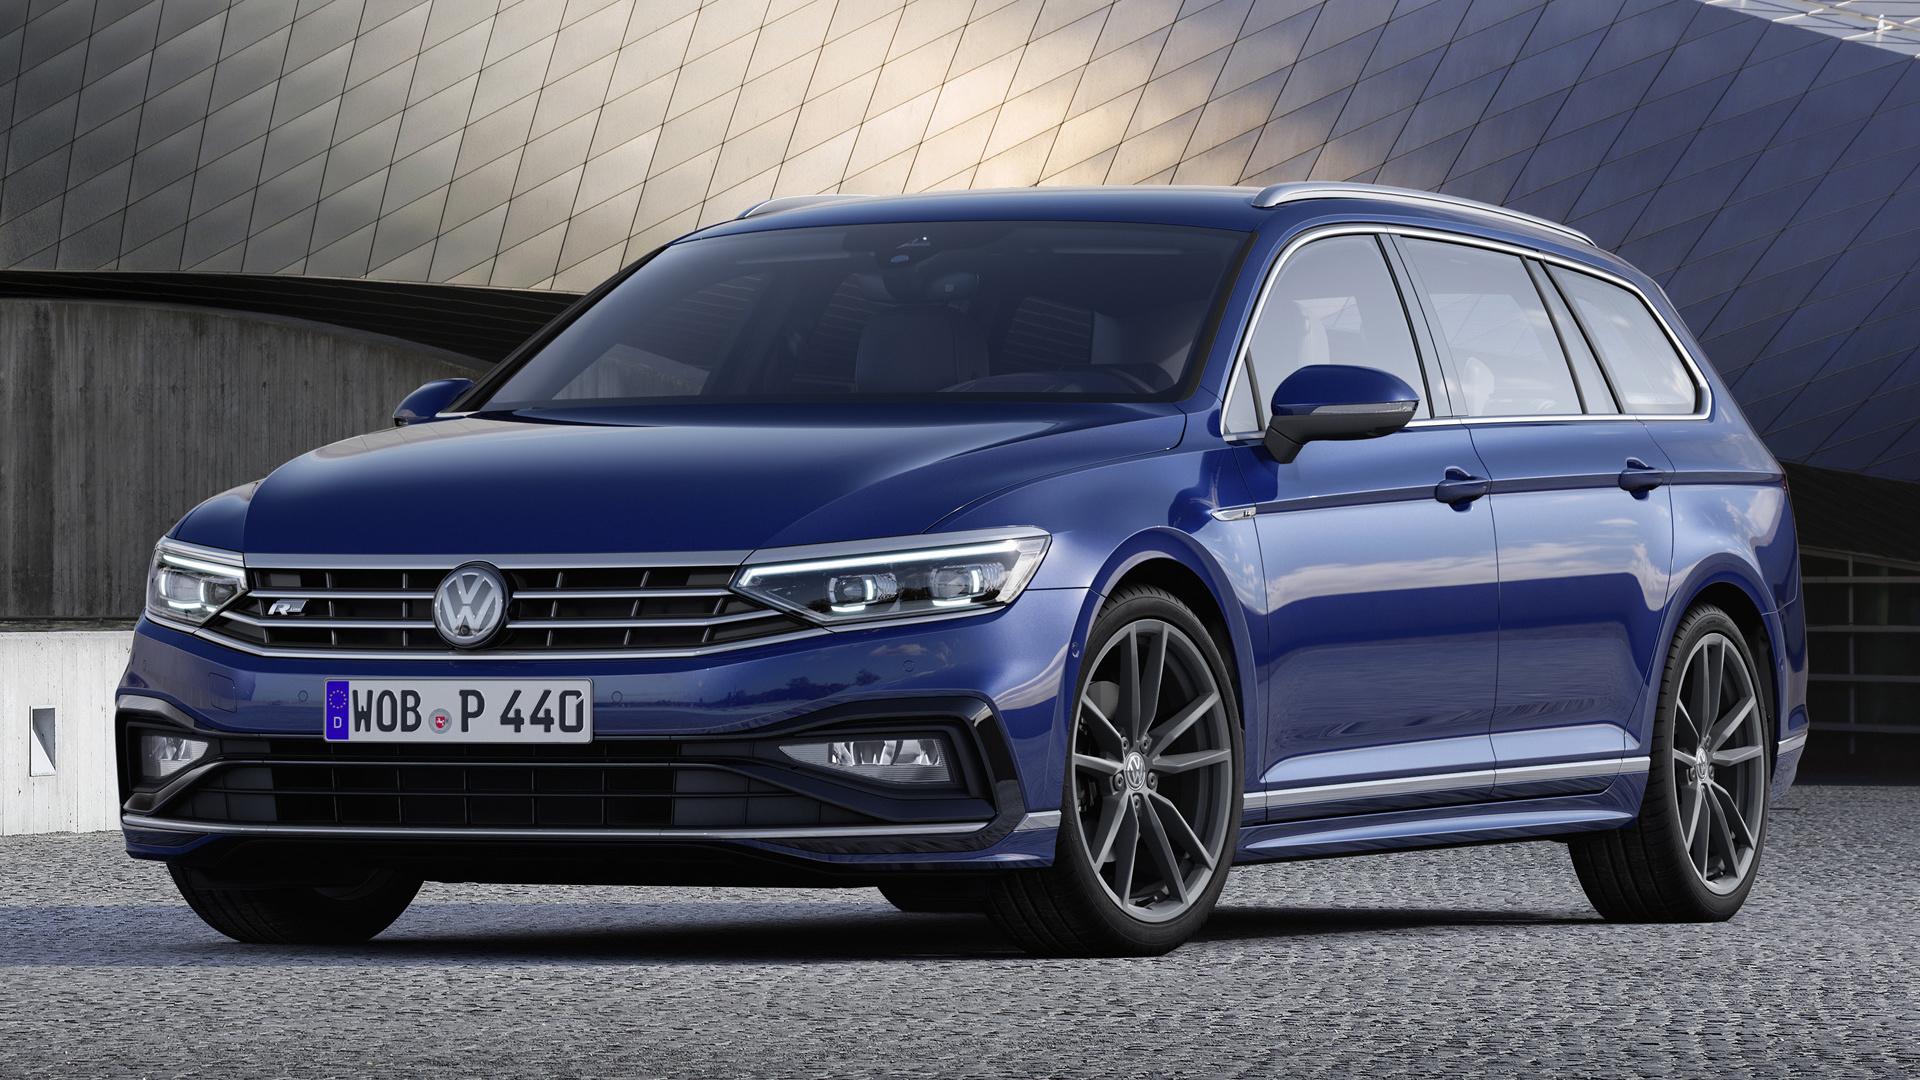 2019 Volkswagen Passat Variant R Line   Wallpapers and HD Images 1920x1080